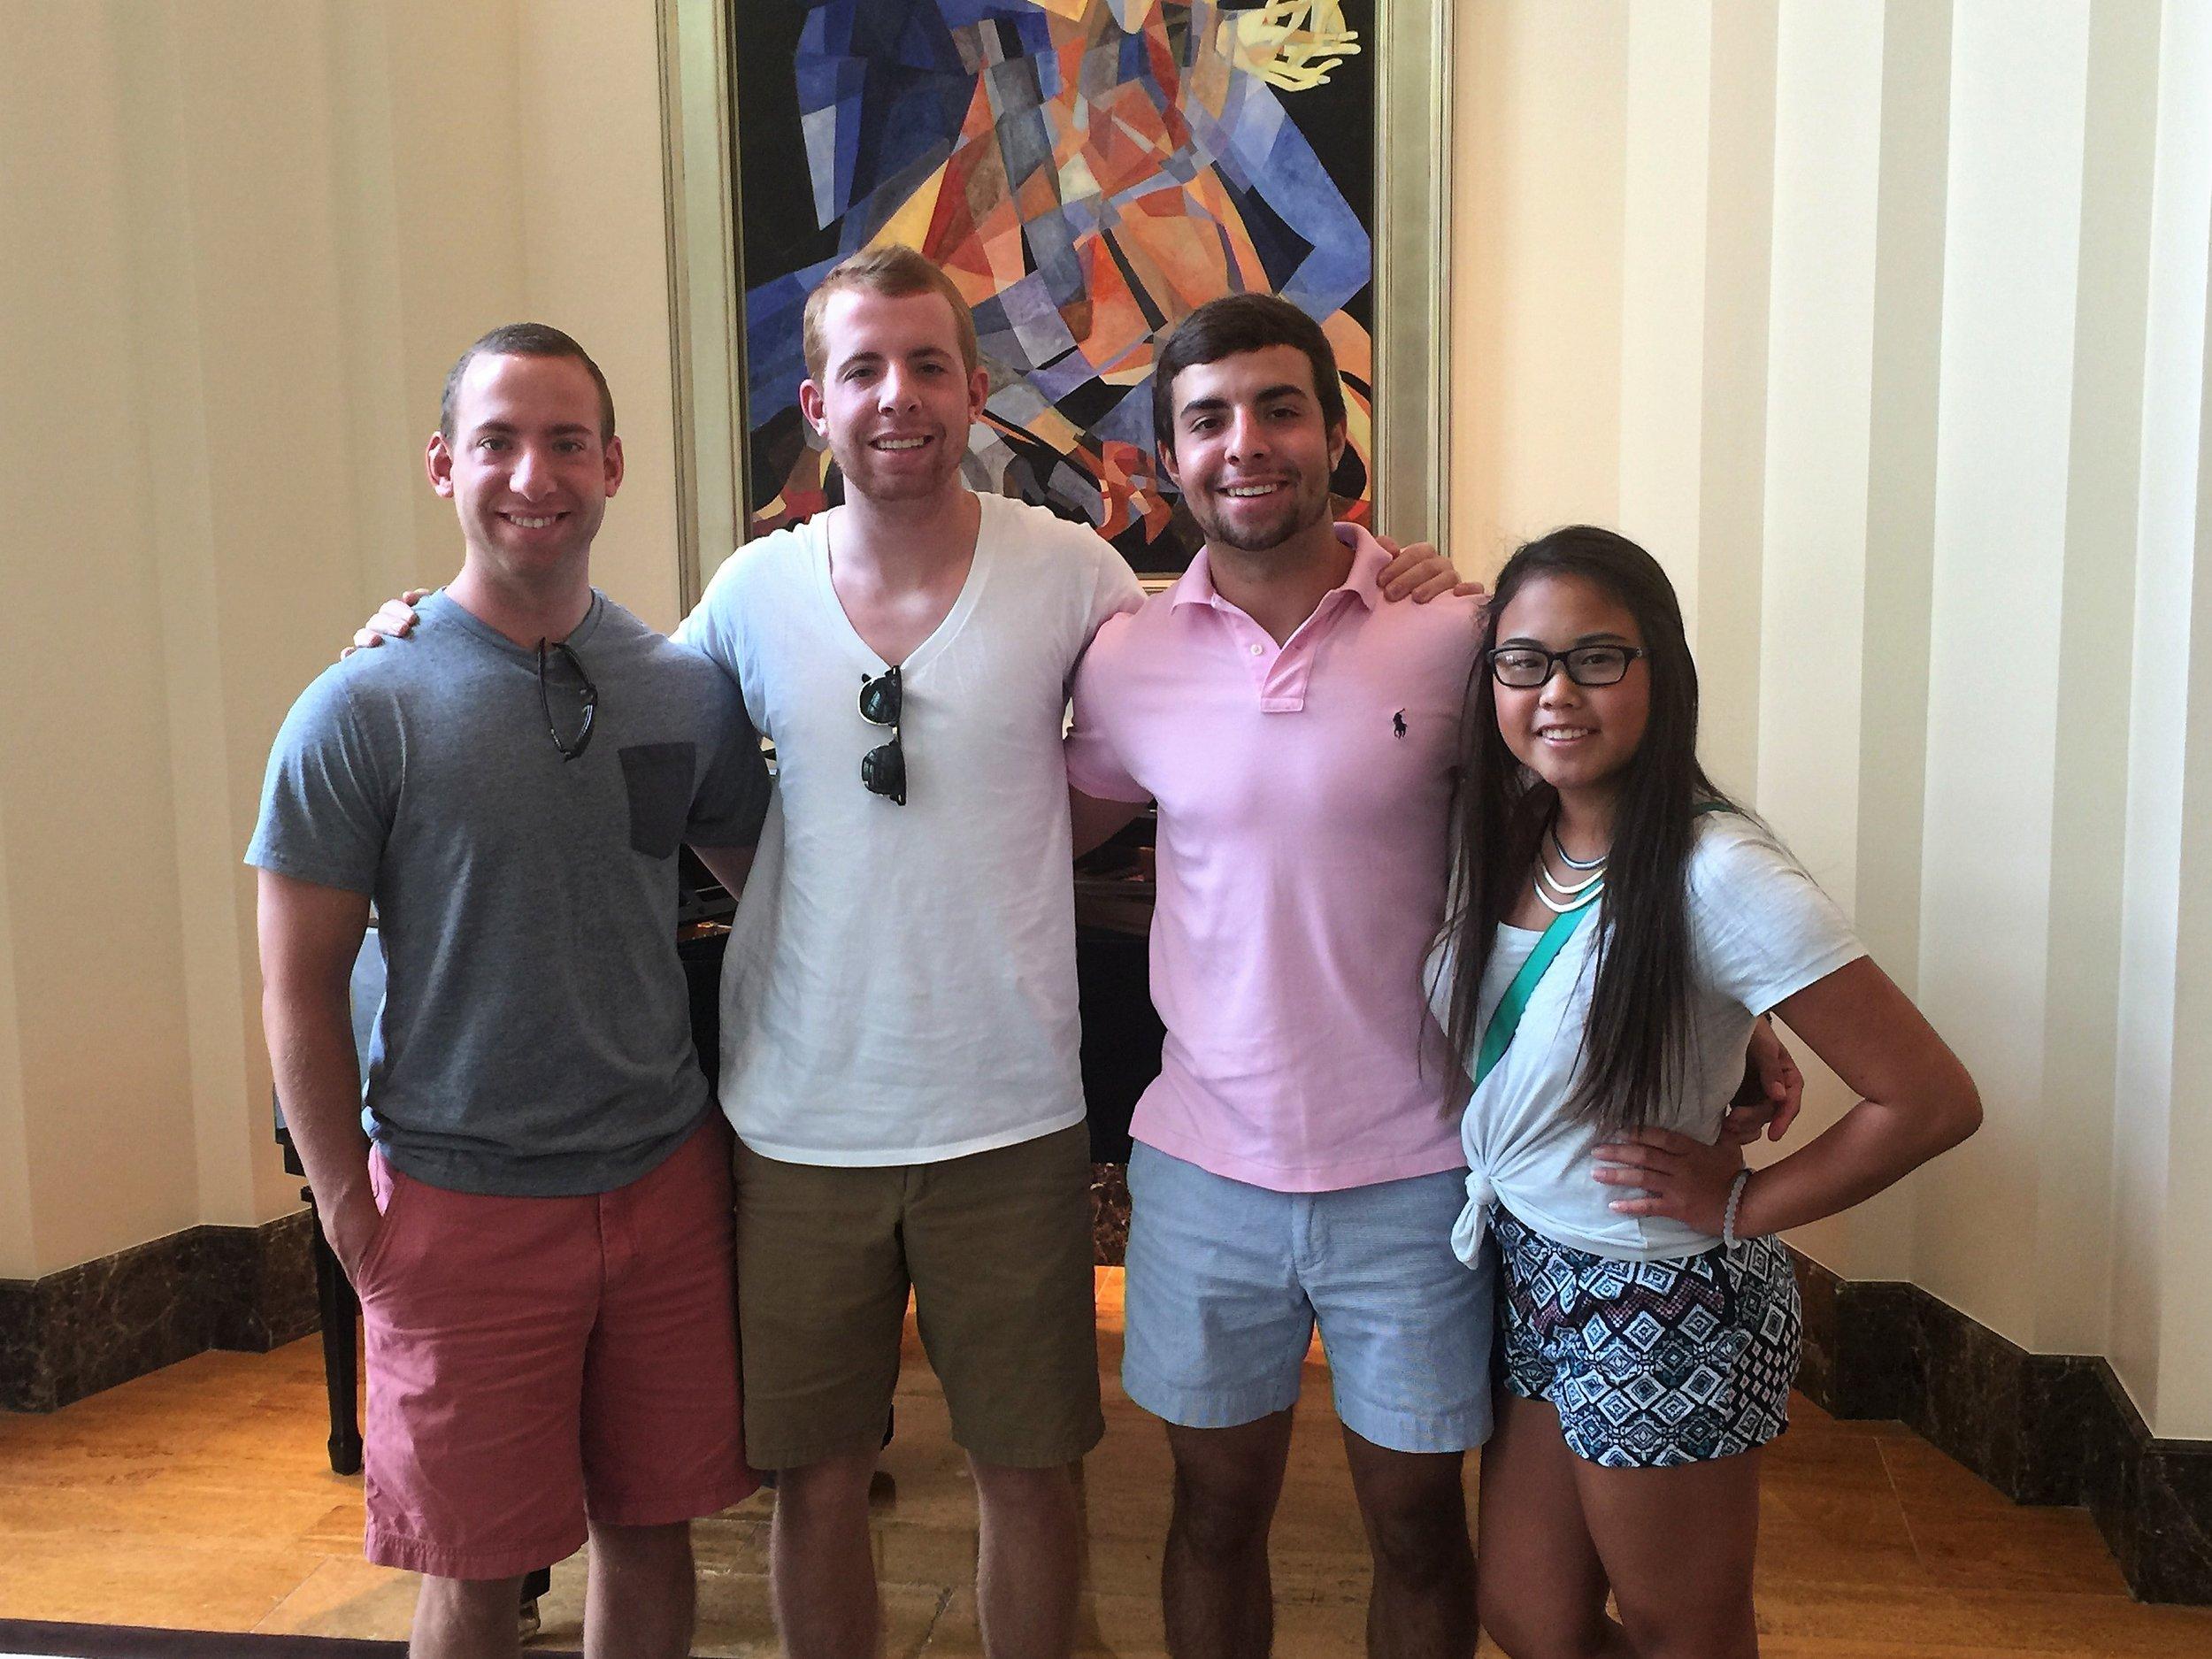 July 19, 2015. Nick already getting in SEAL shape.